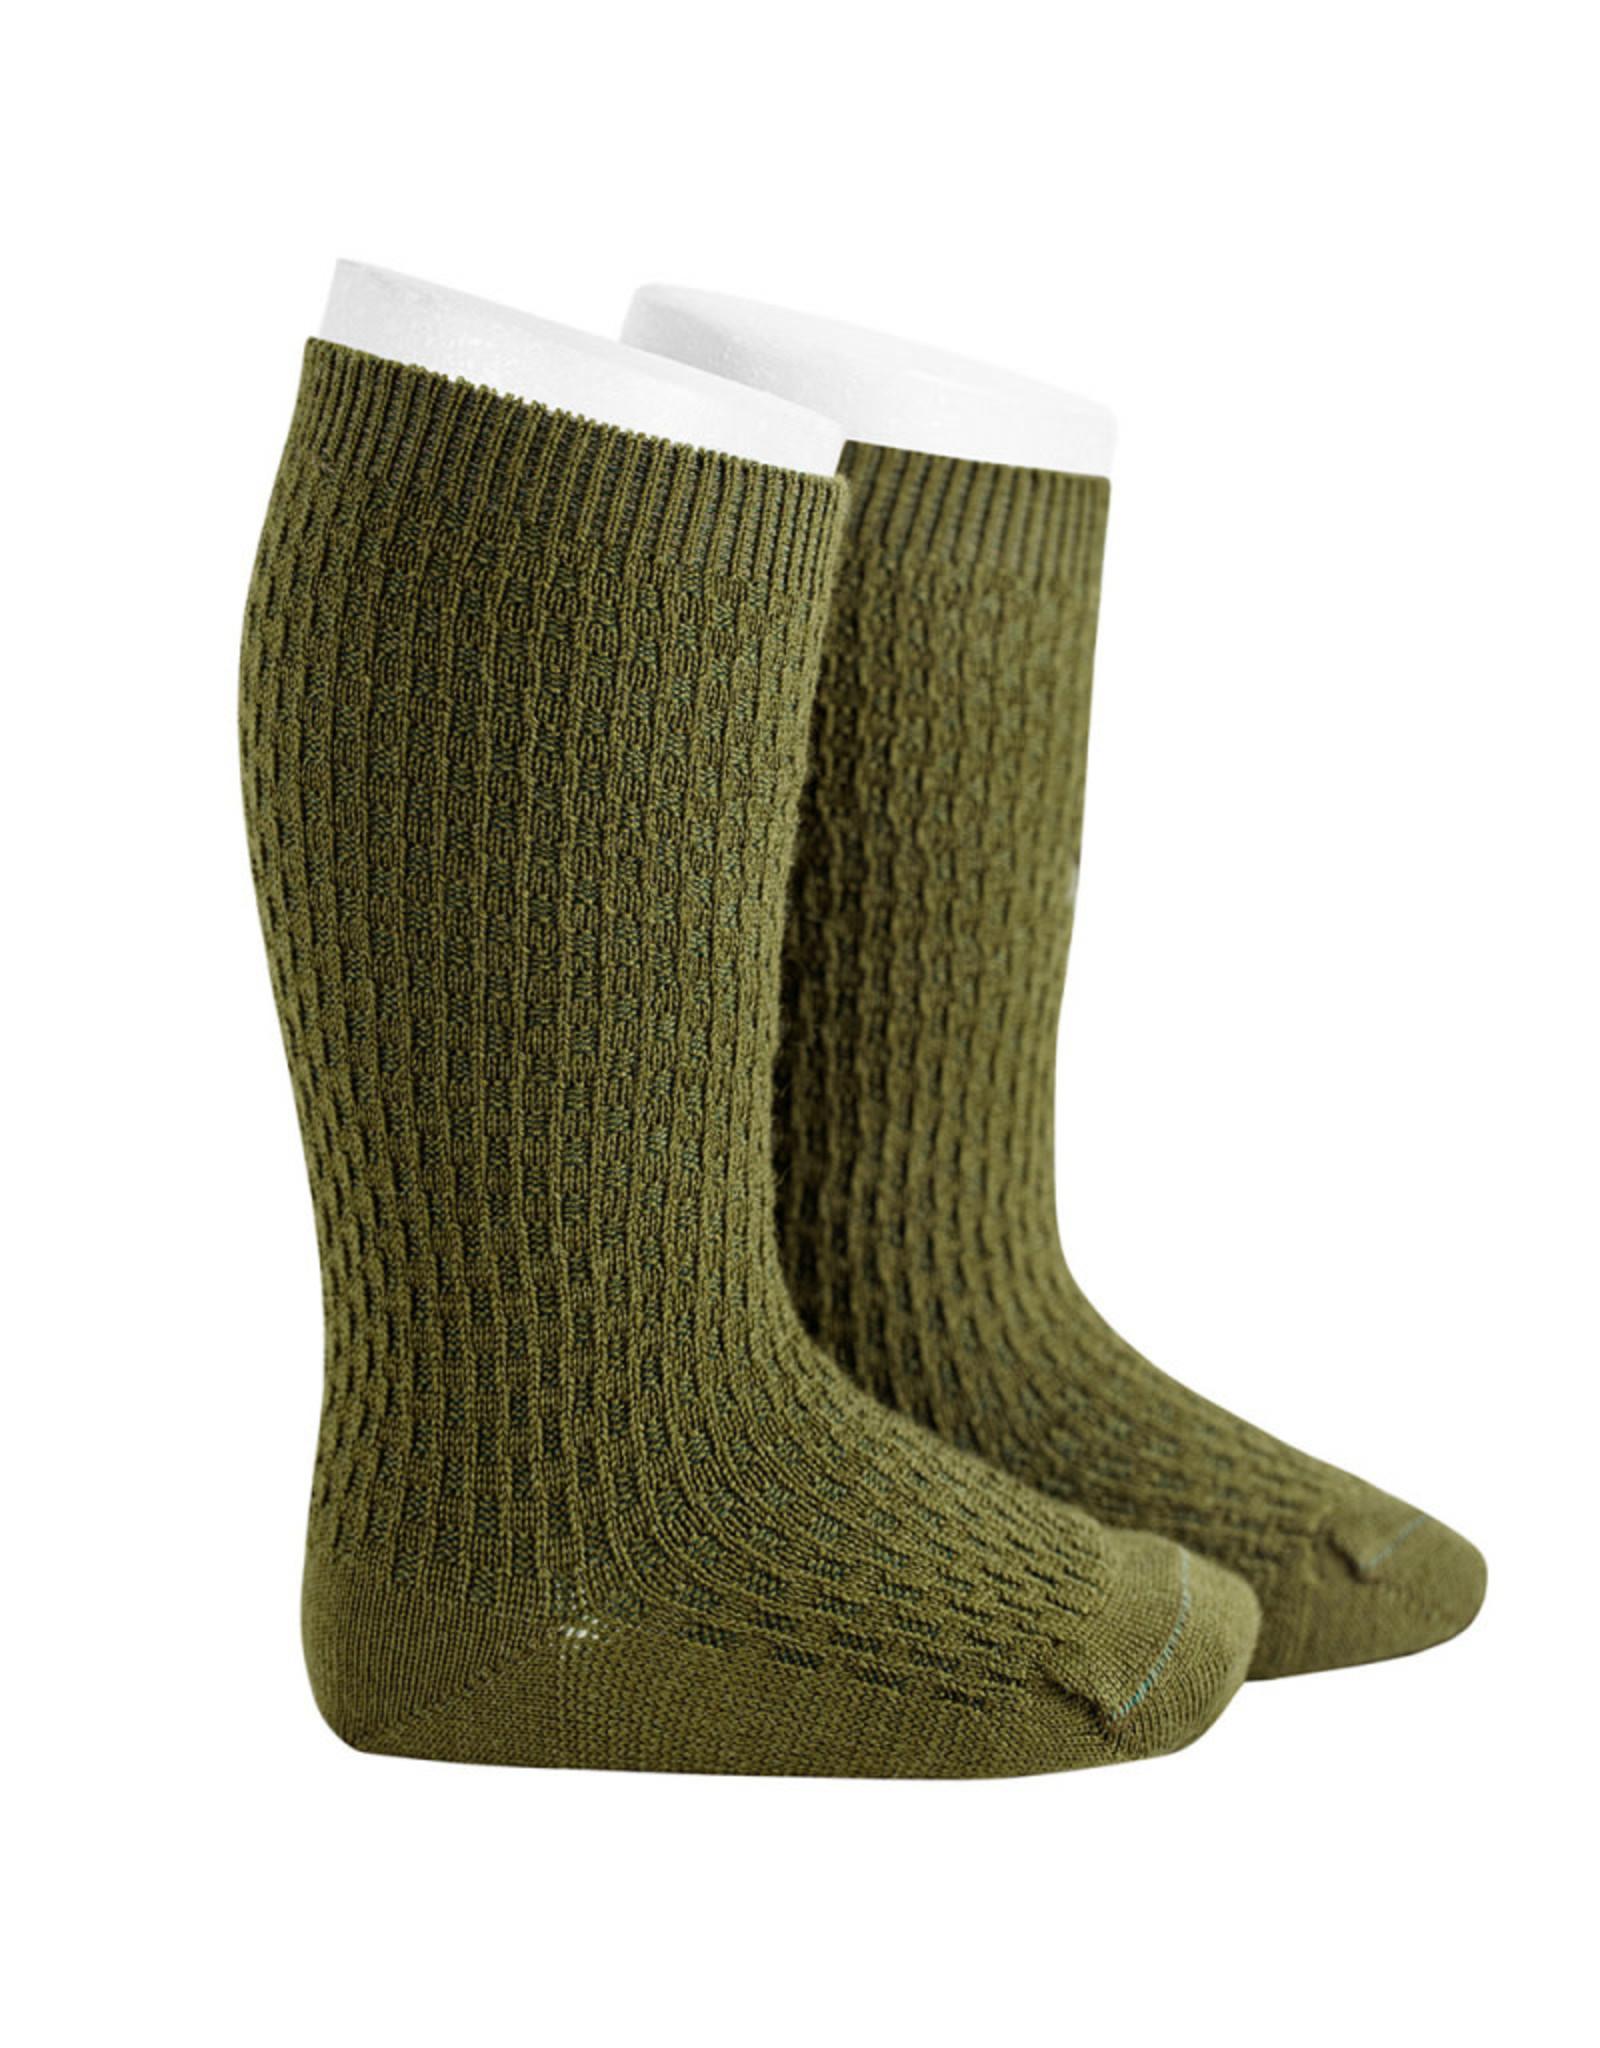 CONDOR Moss Wool Patterned Knee Socks